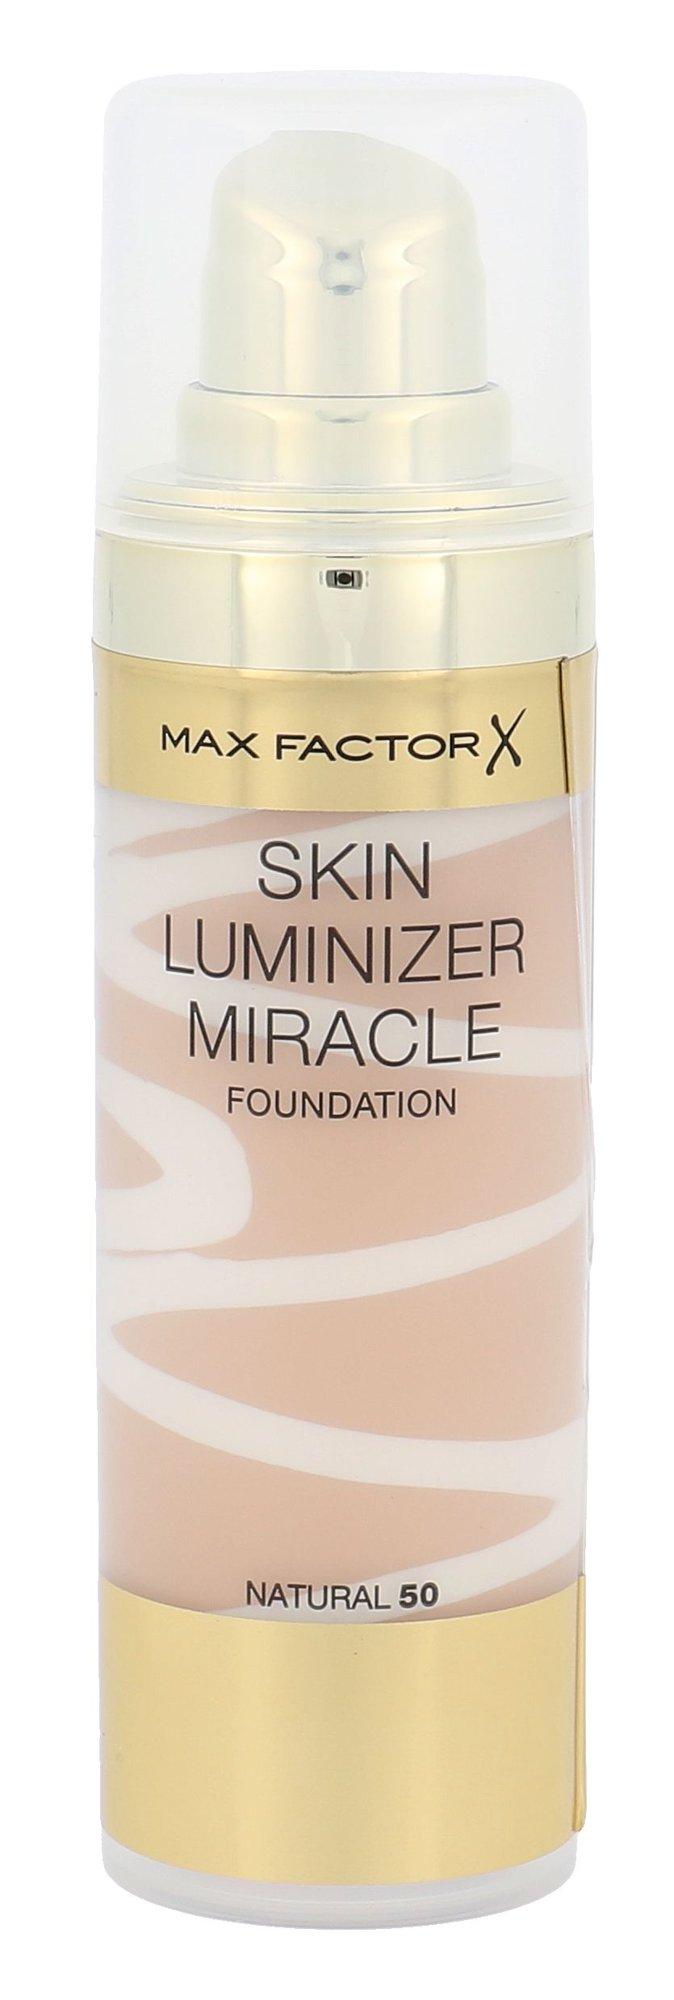 Max Factor Skin Luminizer Cosmetic 30ml 50 Natural